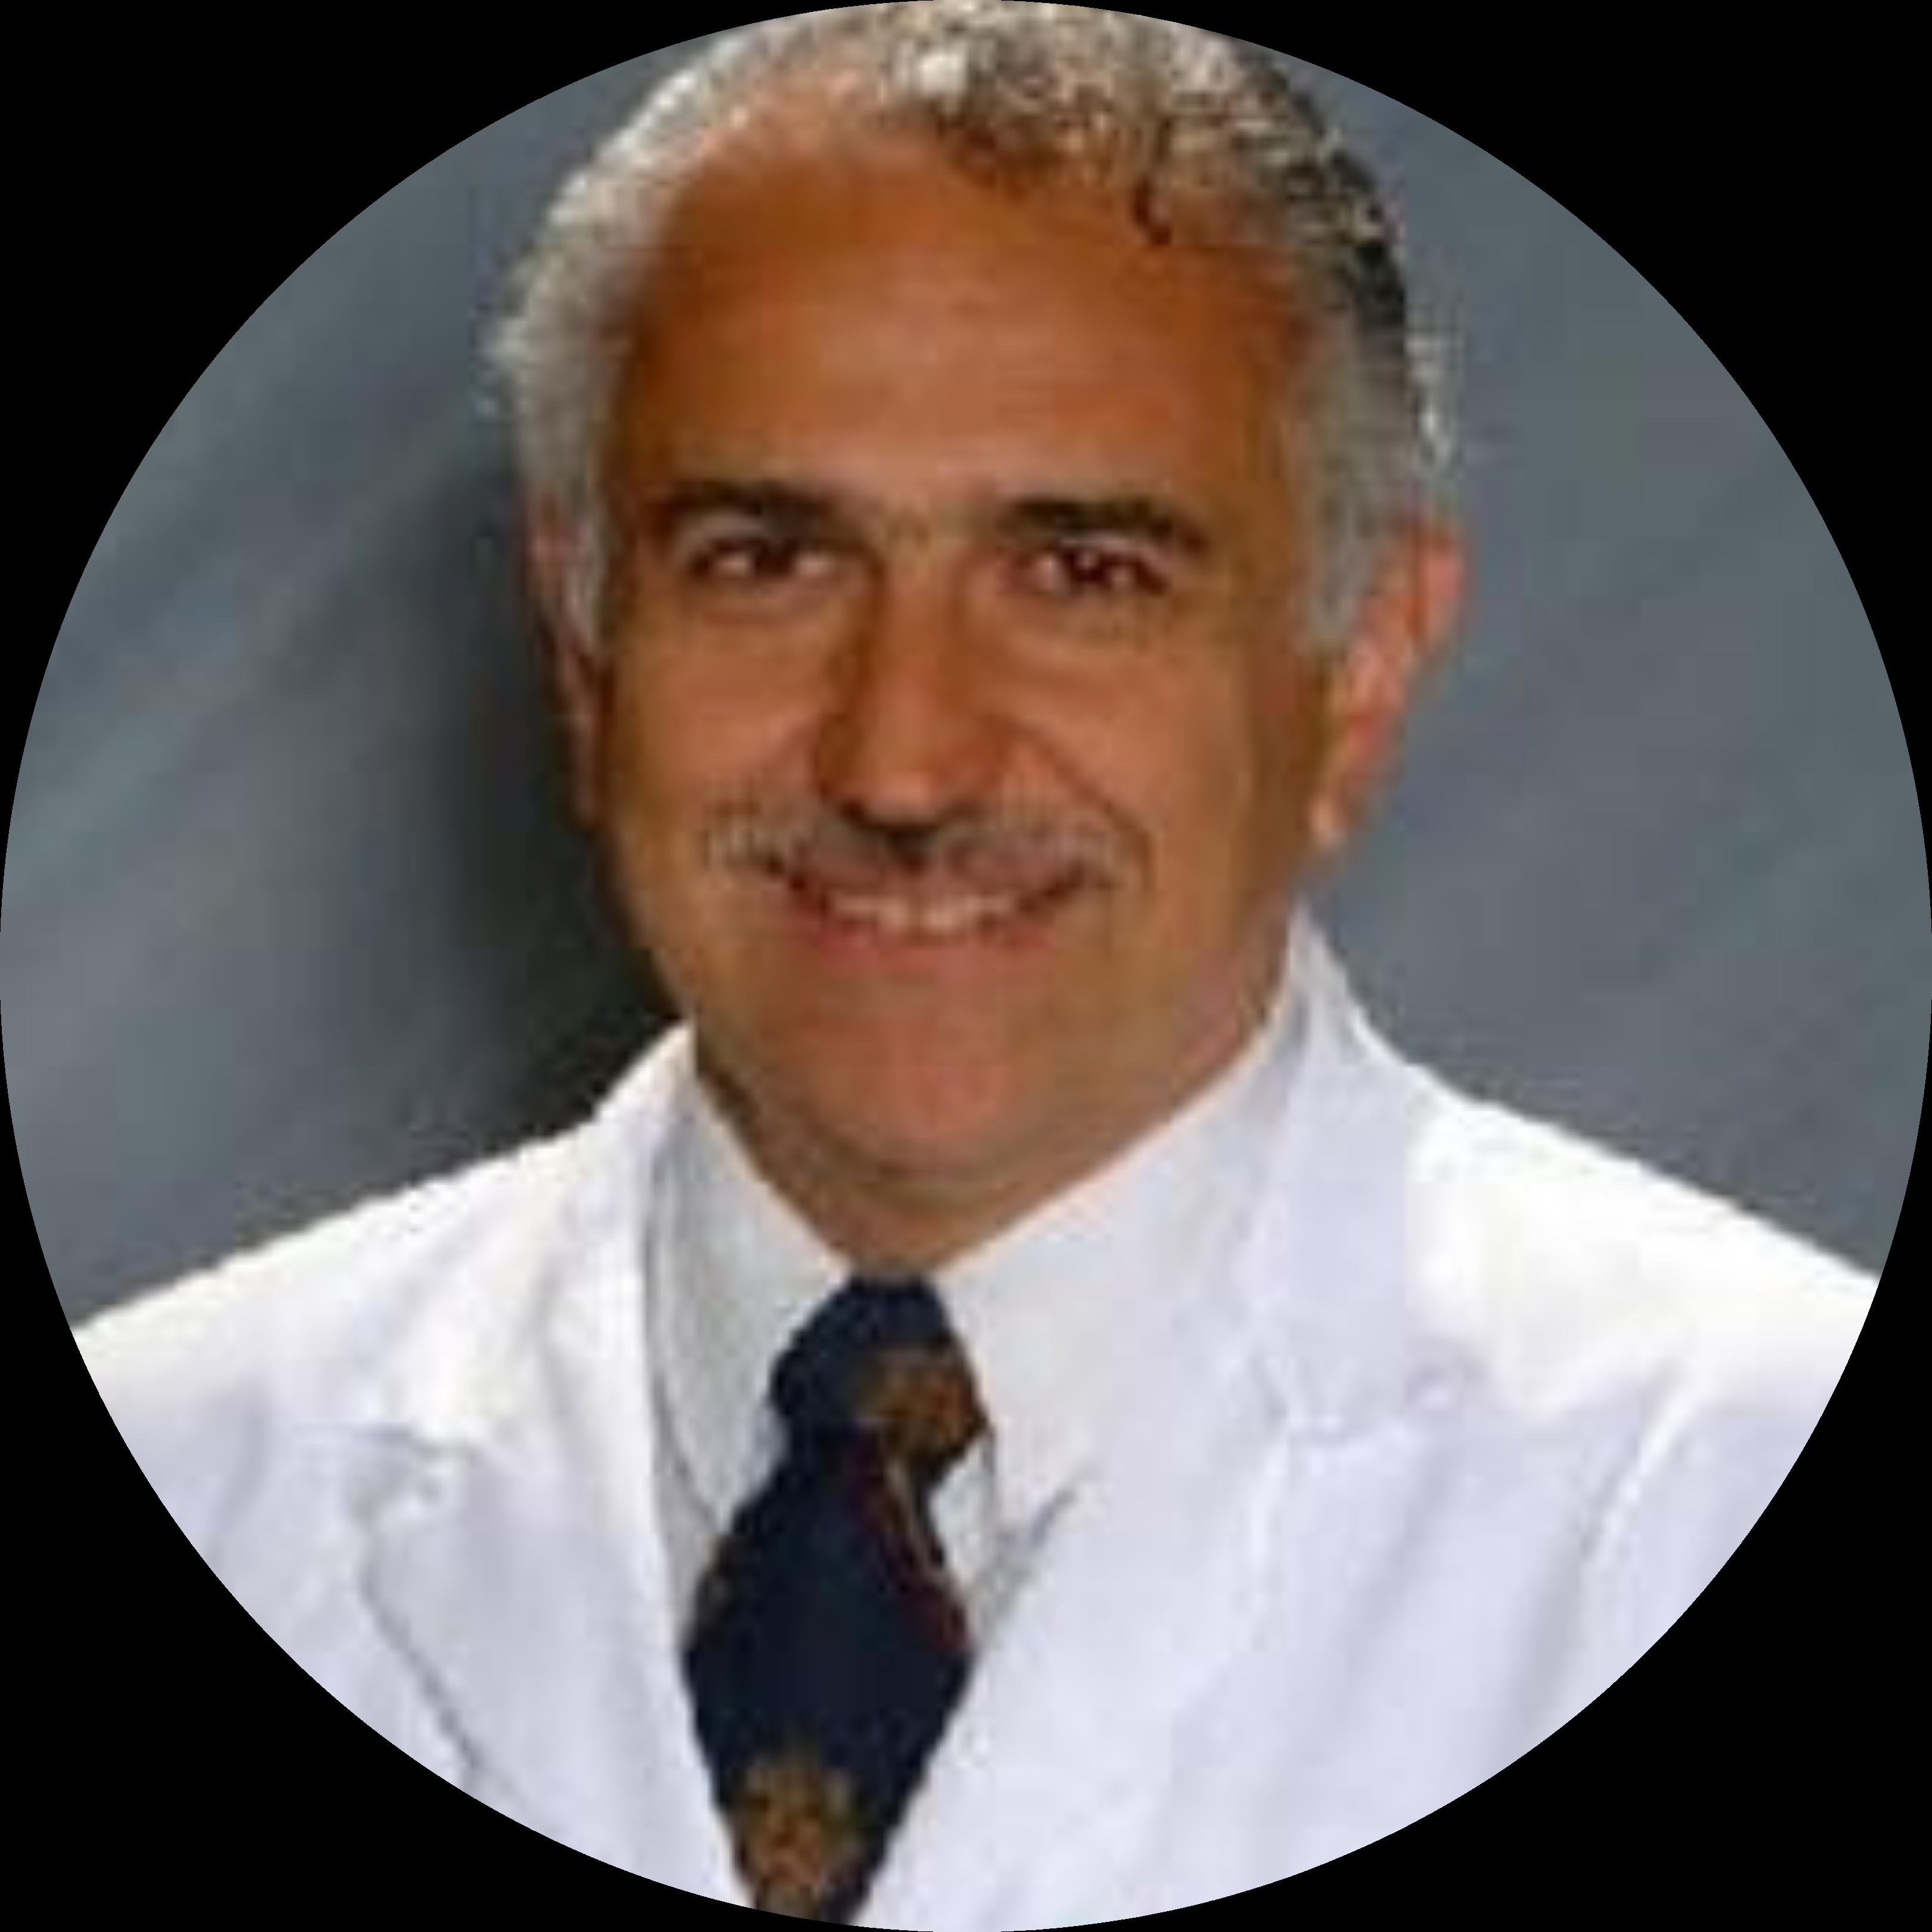 Edward M. DeSimone, R.Ph., Ph.D., FAPhA